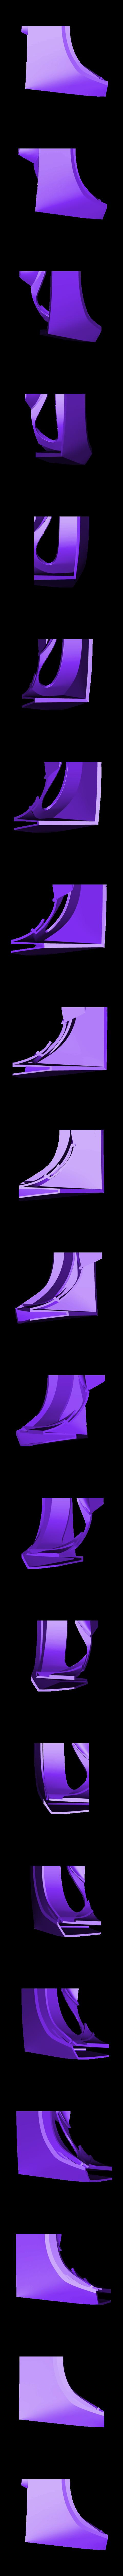 Part 16 v1.stl Download STL file ARF Trooper Helmet • 3D print object, VillainousPropShop